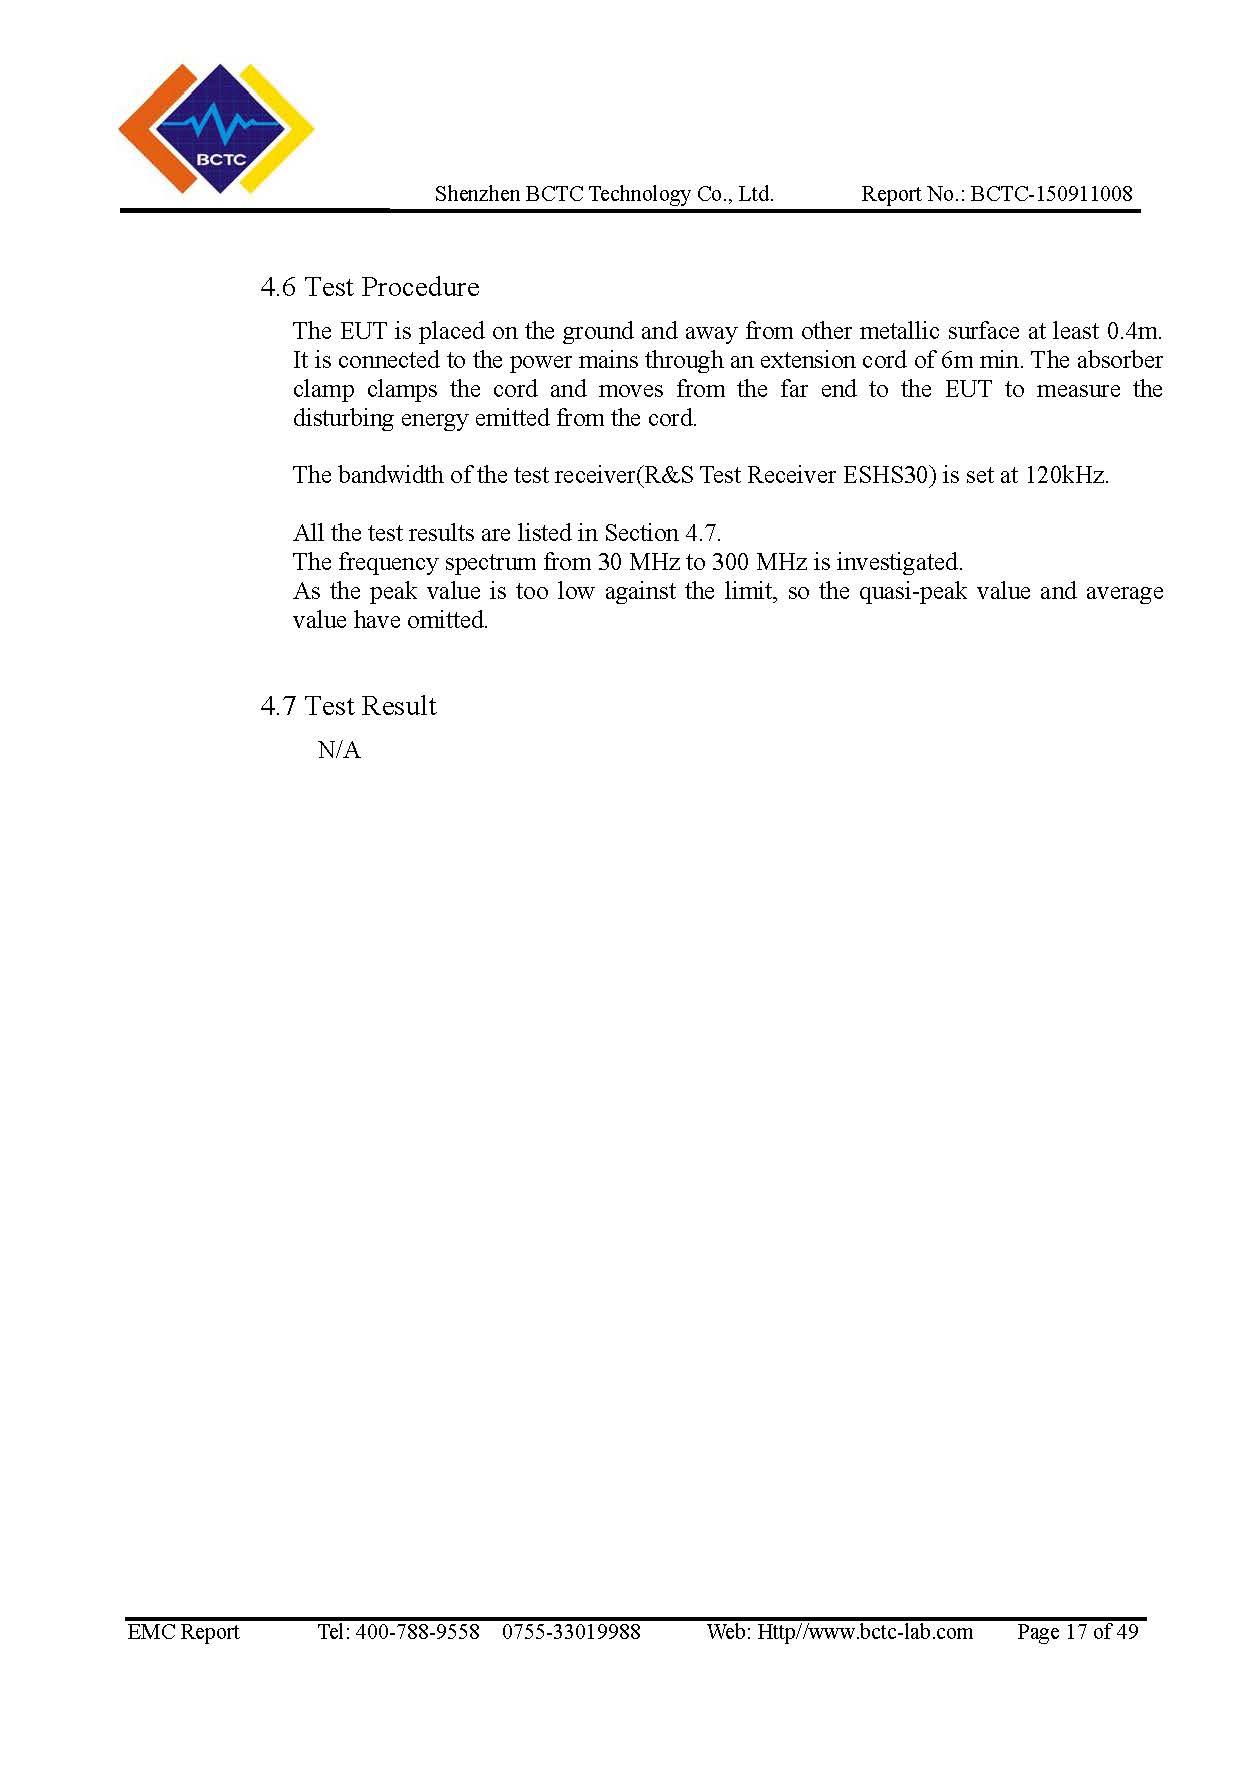 breathe-safe-ce-report-page-17.jpg